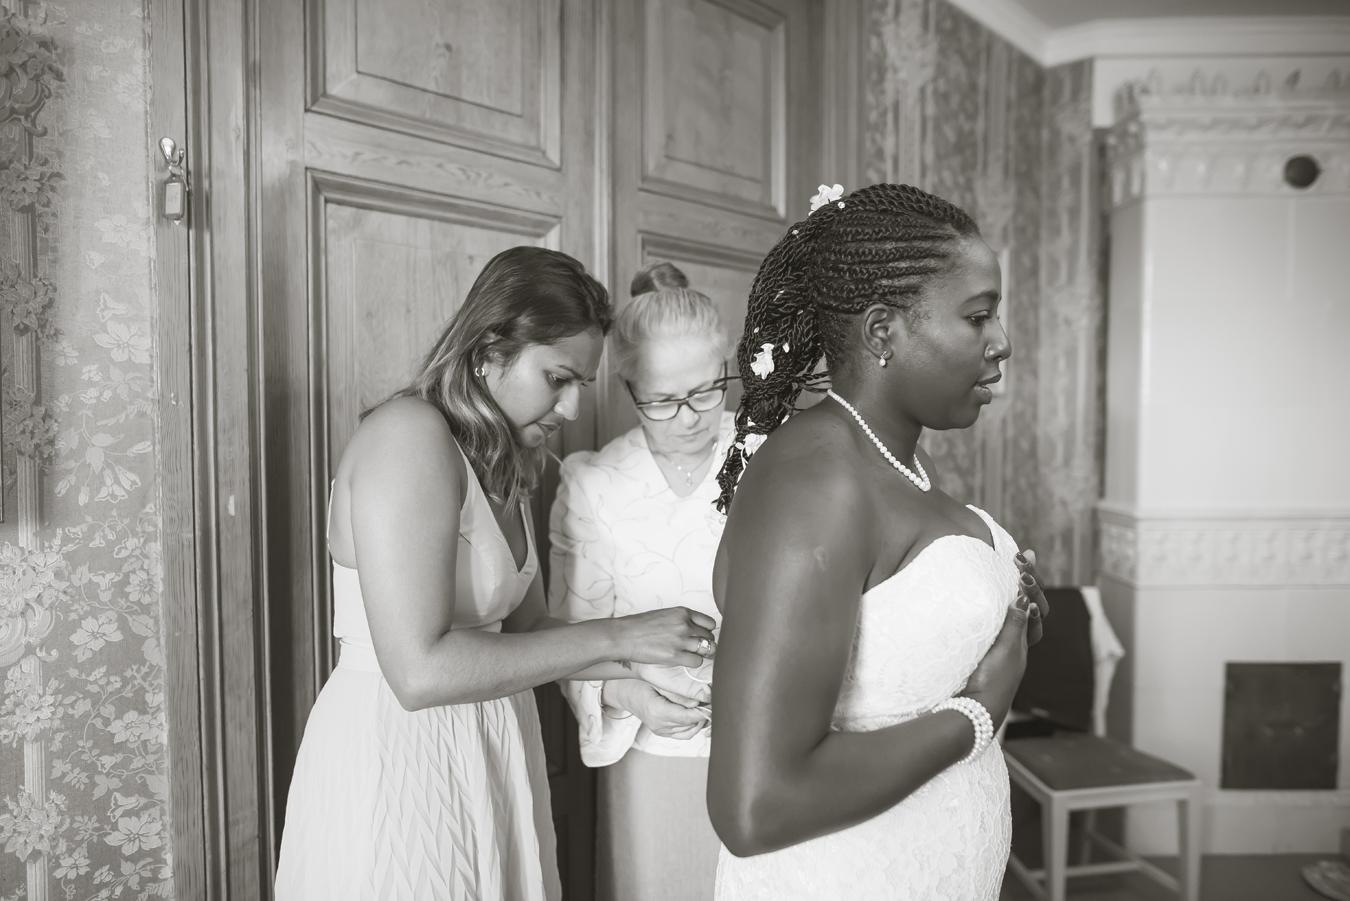 015-bröllop-gotland-pensionat-fridhem.jpg